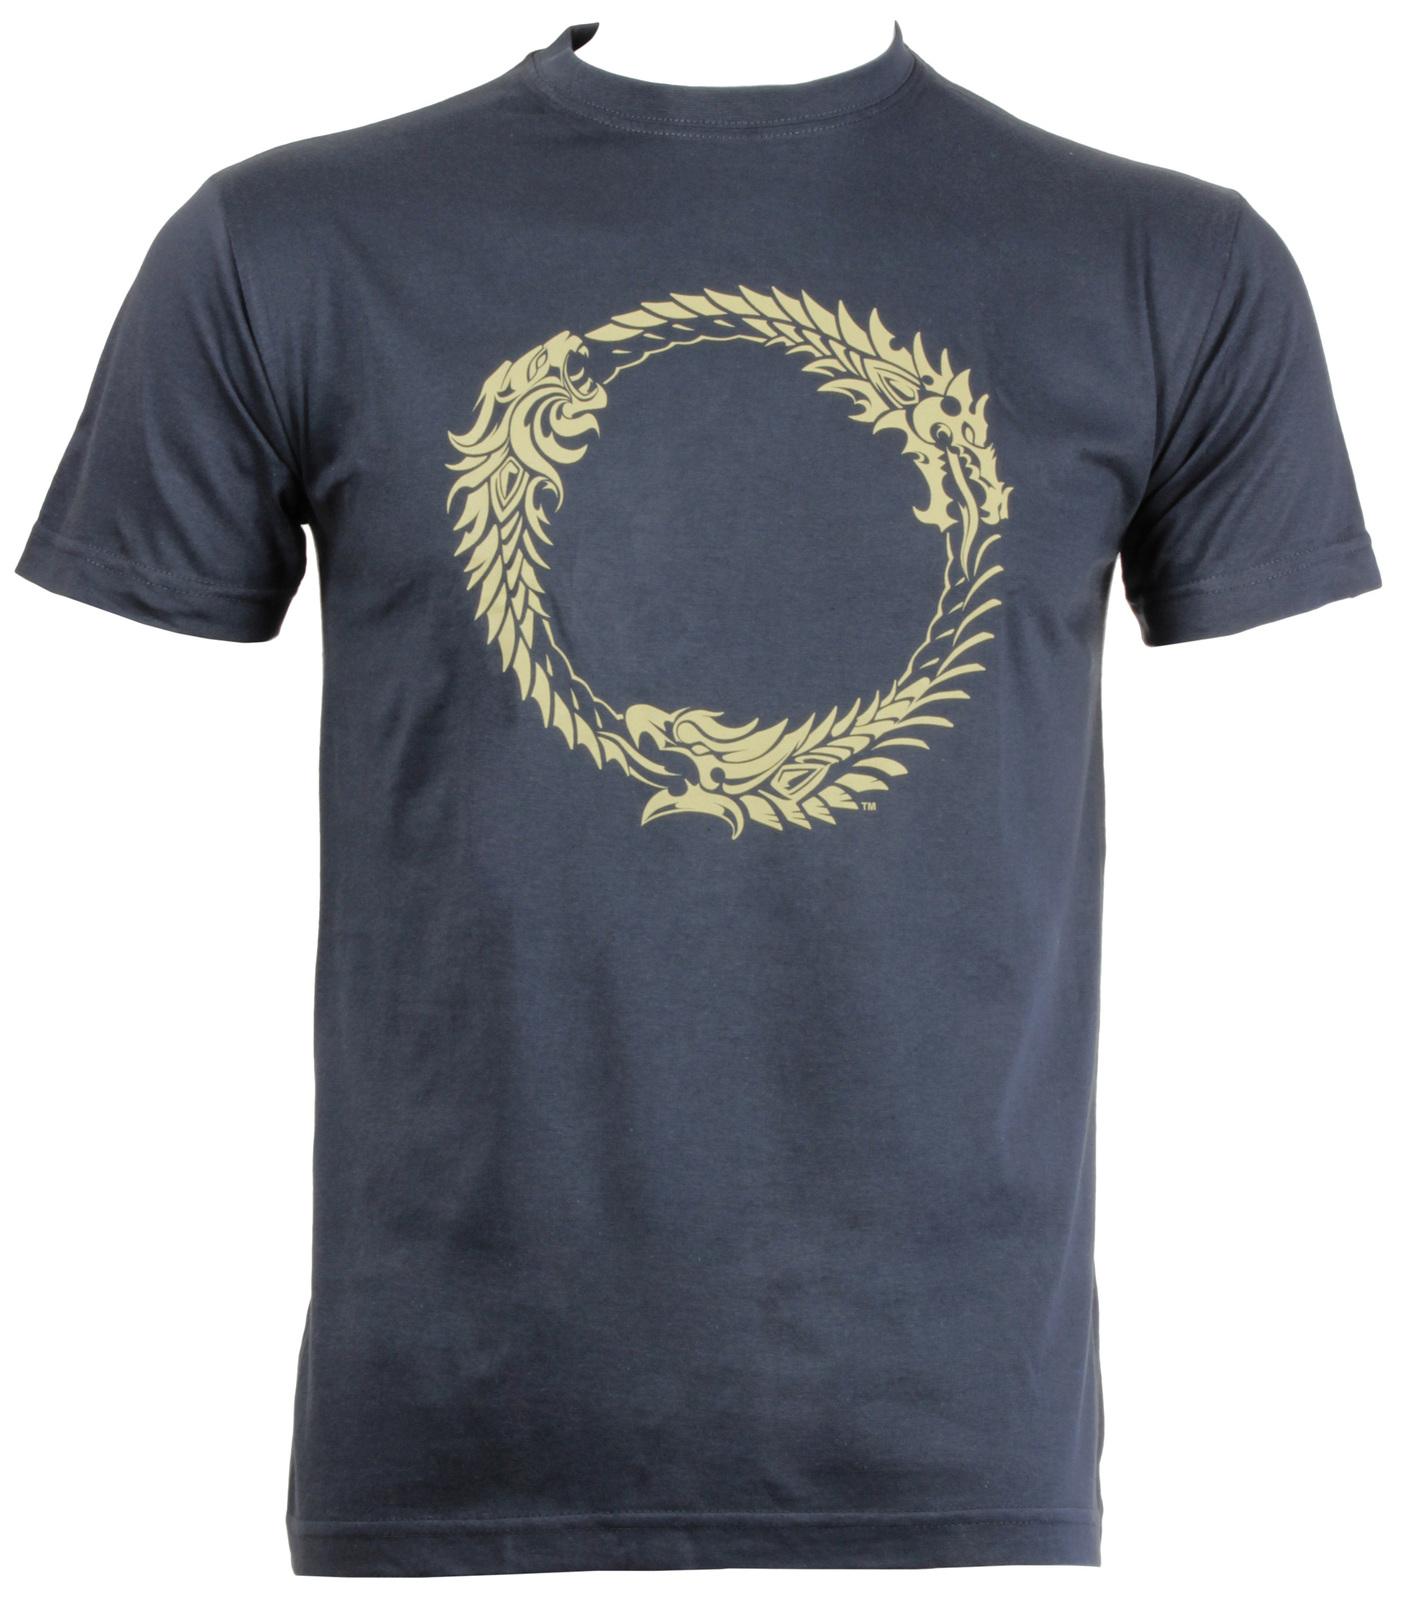 The Elder Scrolls Online T-Shirt Ouroboros (Large) image